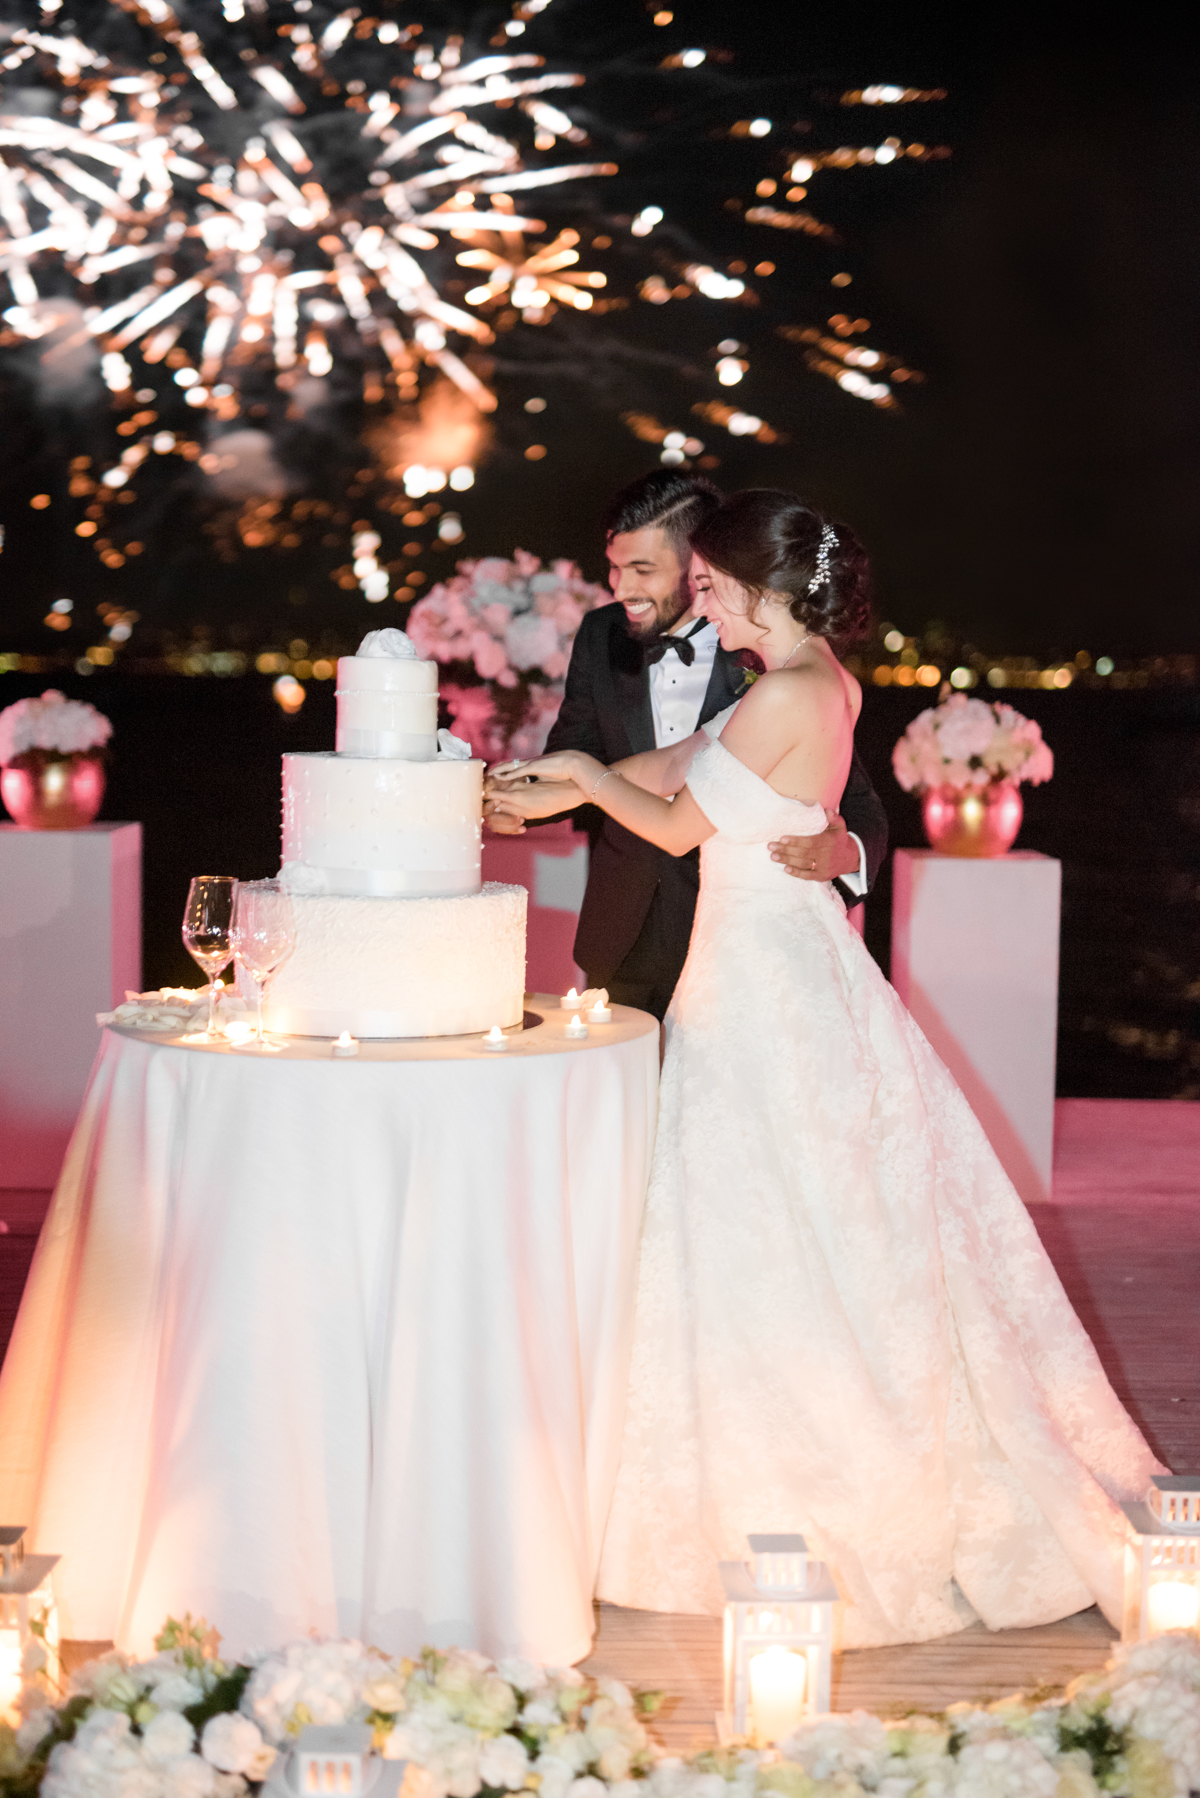 Palace_Villa_Cortine_Hotel_Italian_Wedding_Photographer_Sirmione_AKP-48.jpg